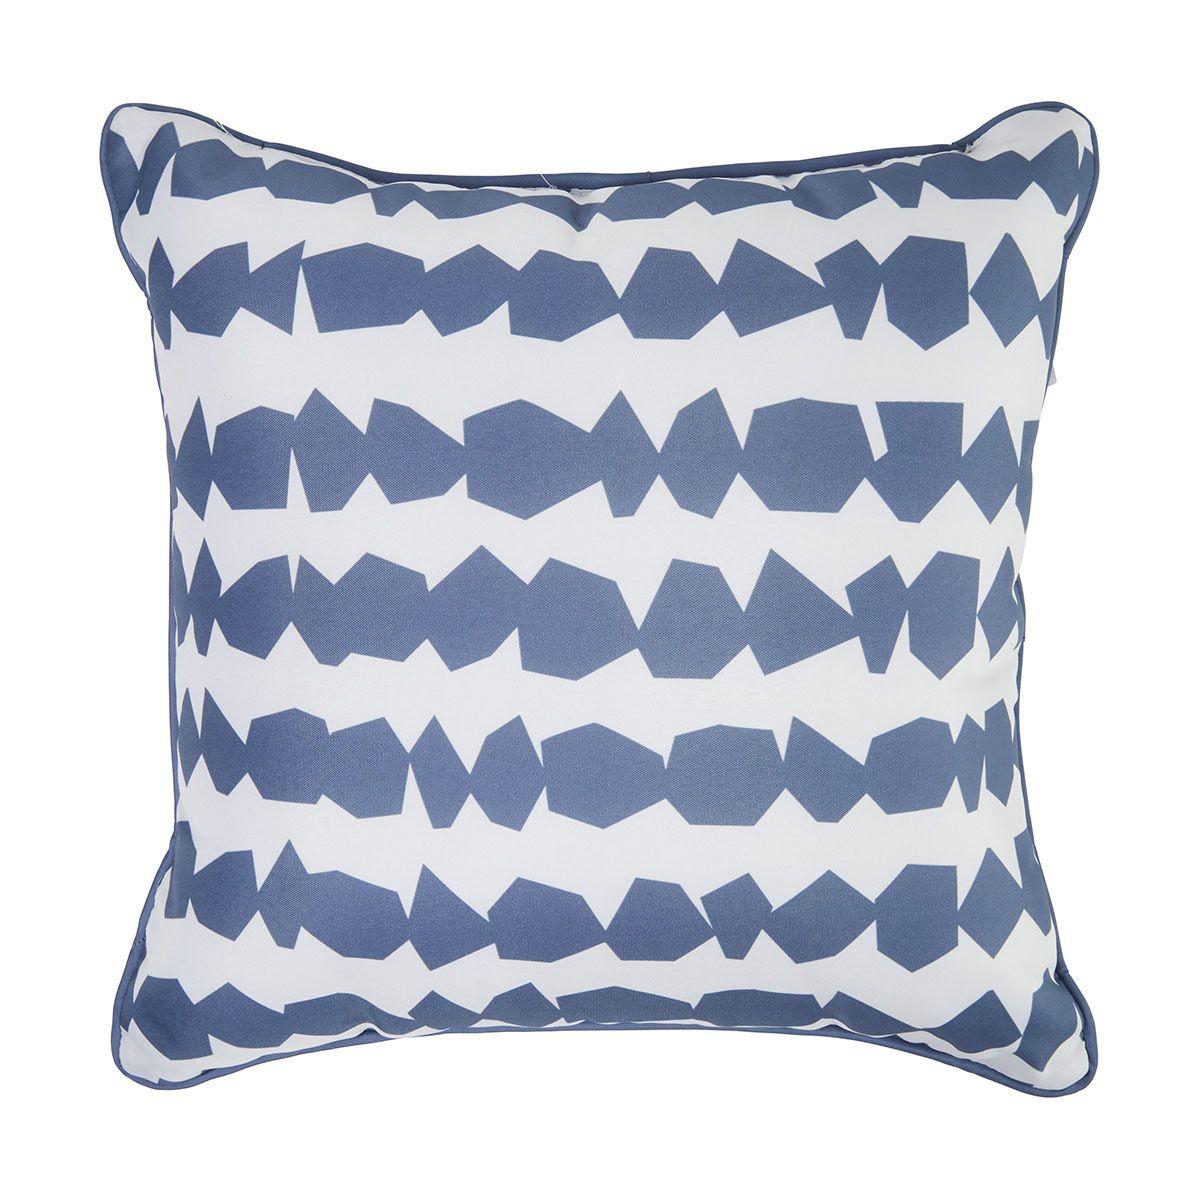 38cm Geo Outdoor Cushion Kmart Outdoor cushions